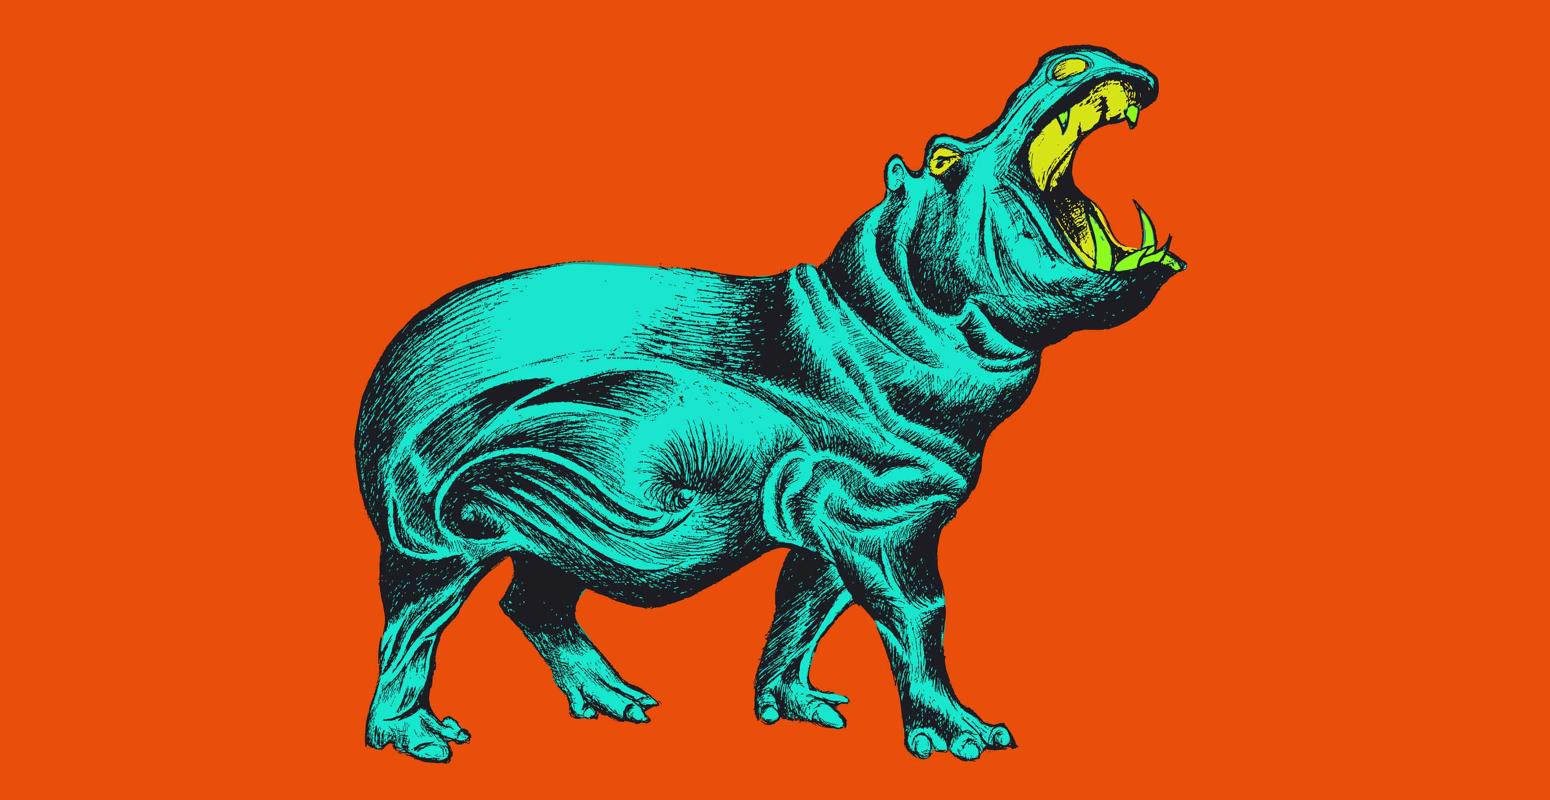 2D Retro Roaring Hippo Illustration Image